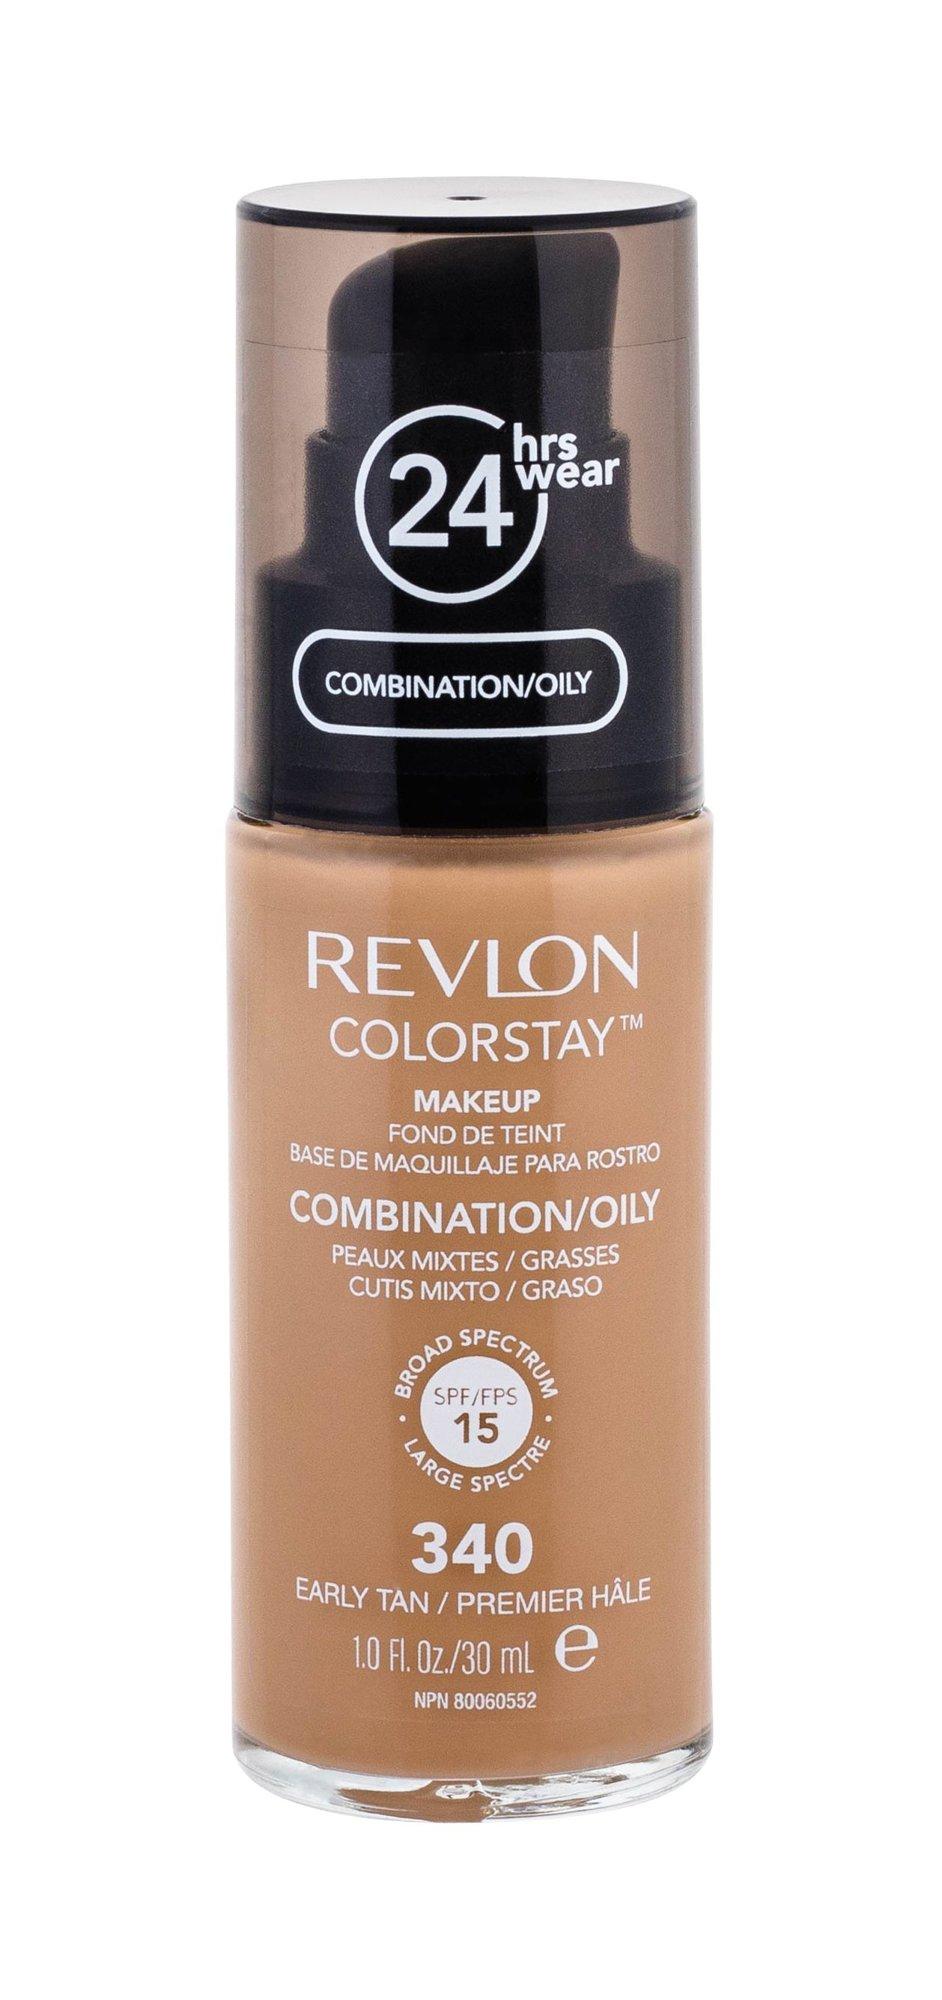 Revlon Colorstay Cosmetic 30ml 340 Early Tan